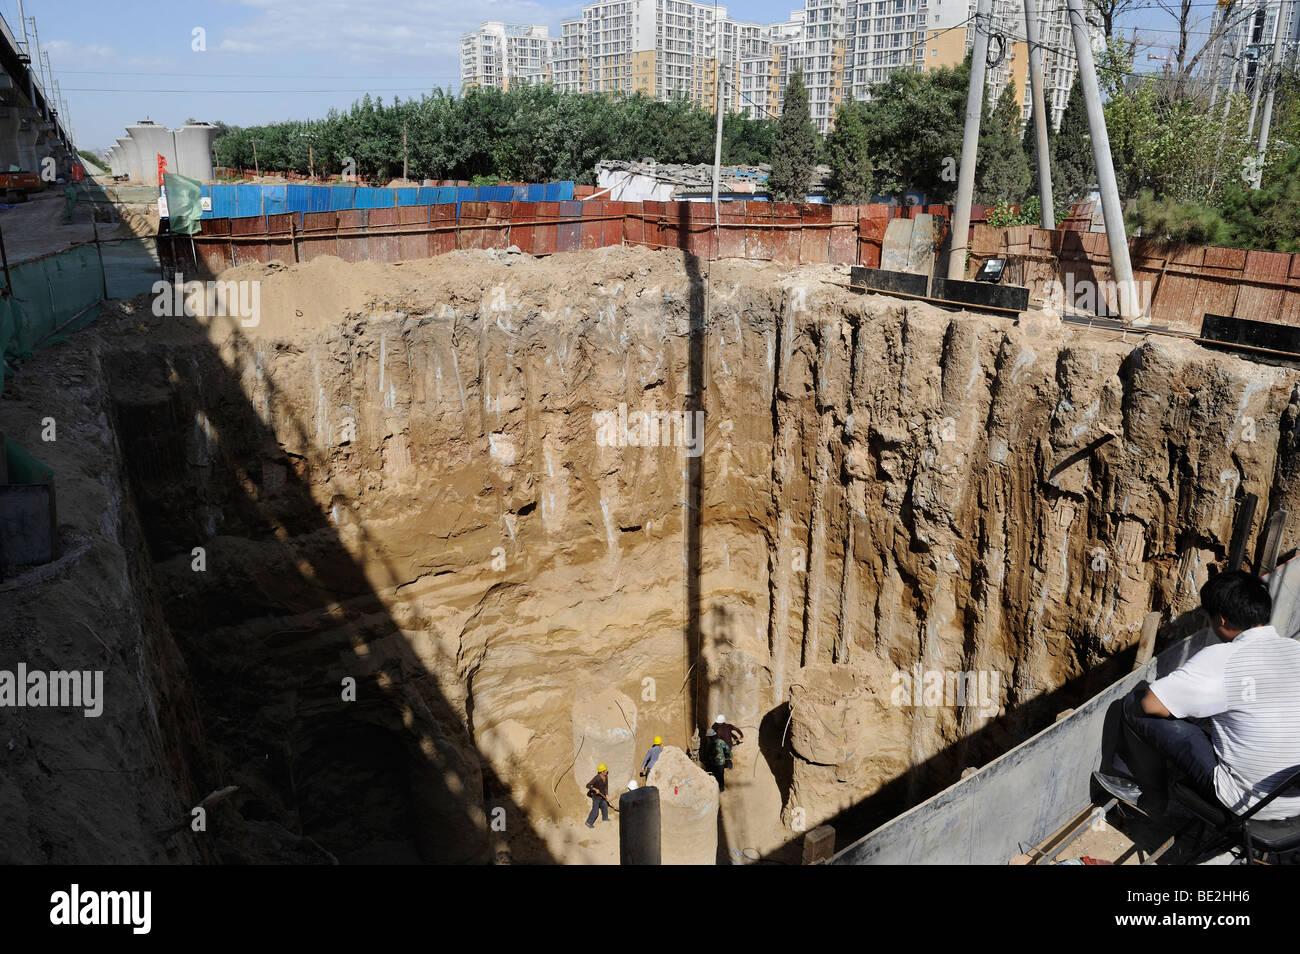 construction site of Beijing-Shanghai high-speed railway in Beijing, China. 11-Sep-2009 - Stock Image